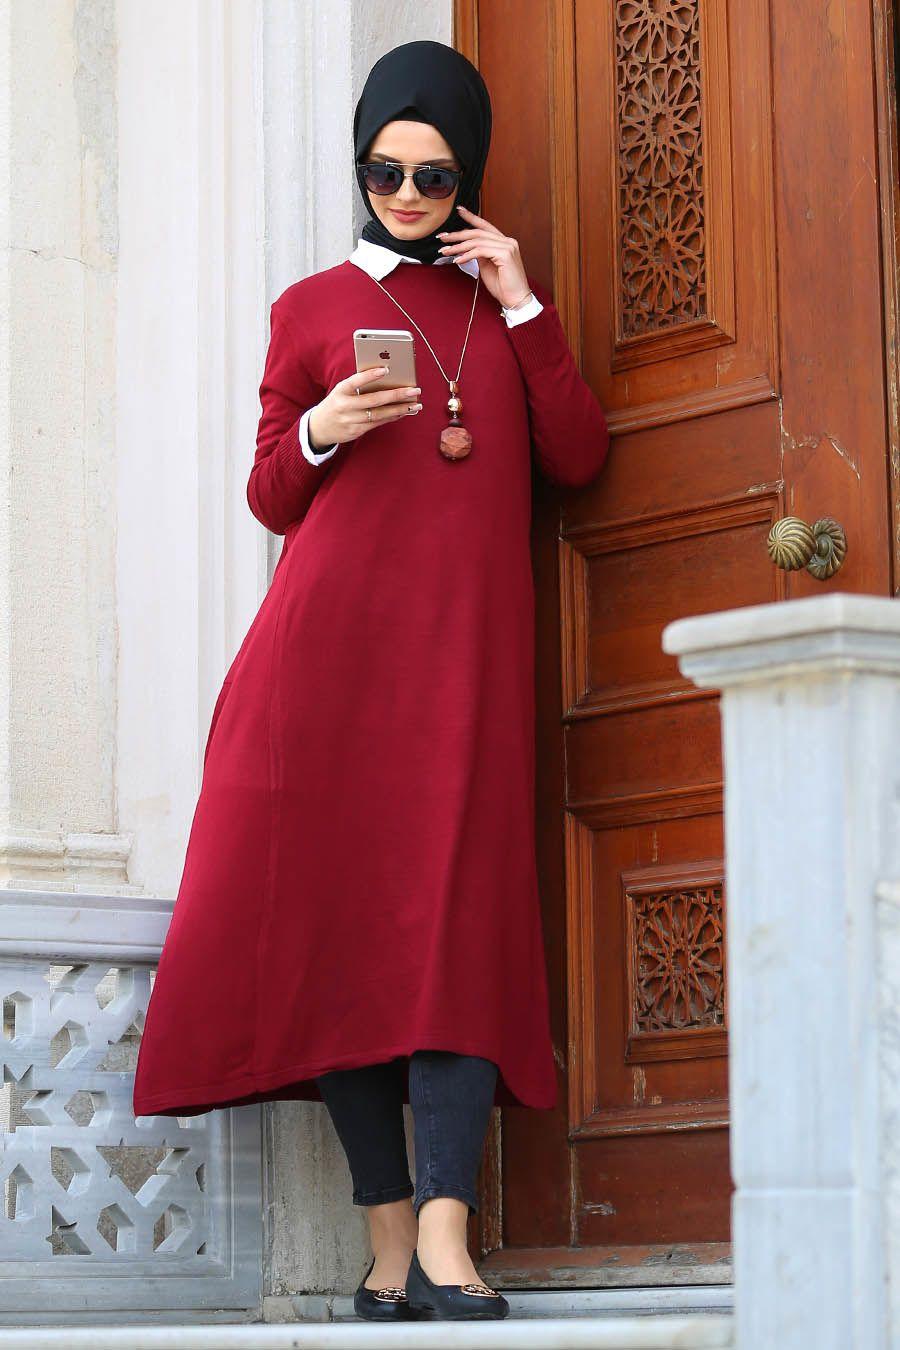 Hijab Fashion 4  Fashion, Fashion outfits, Hijab fashion